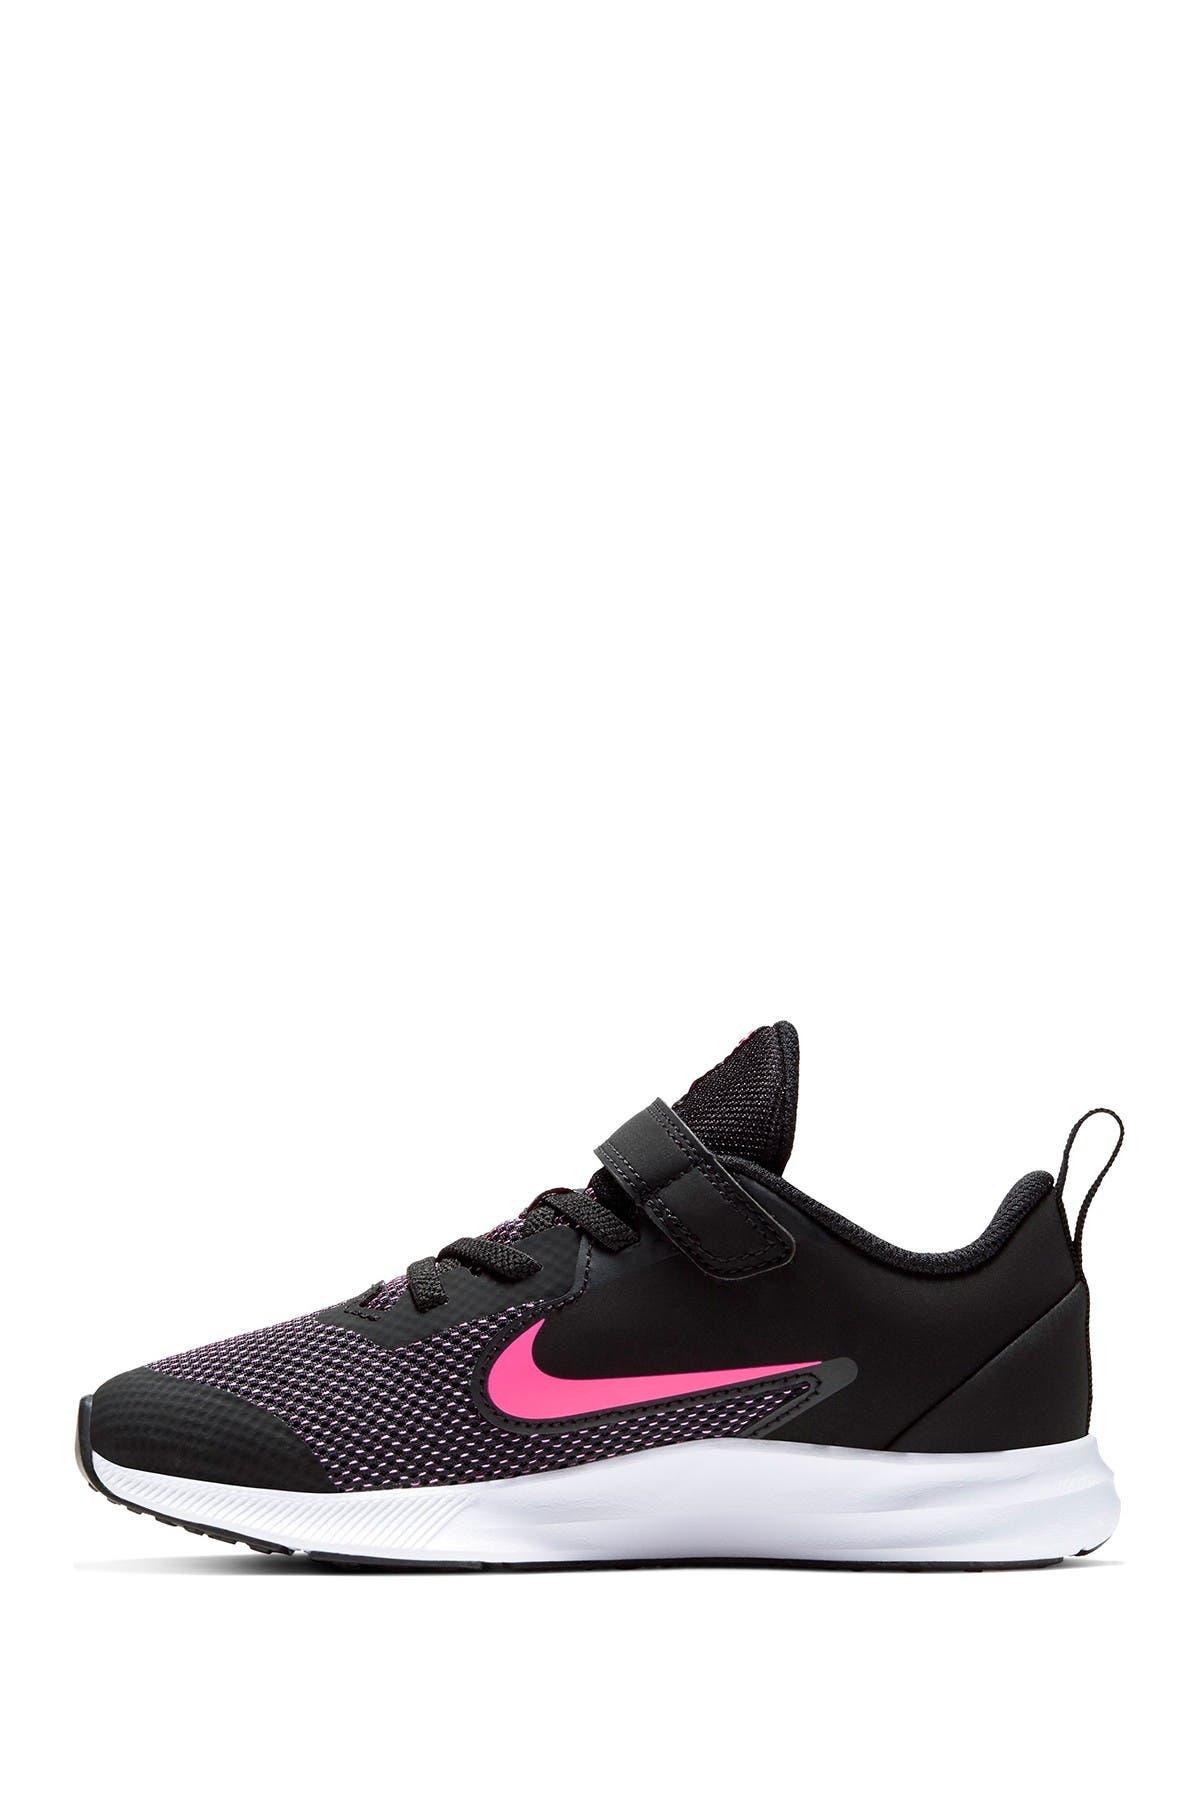 Nike | Downshifter 9 PSV Sneaker